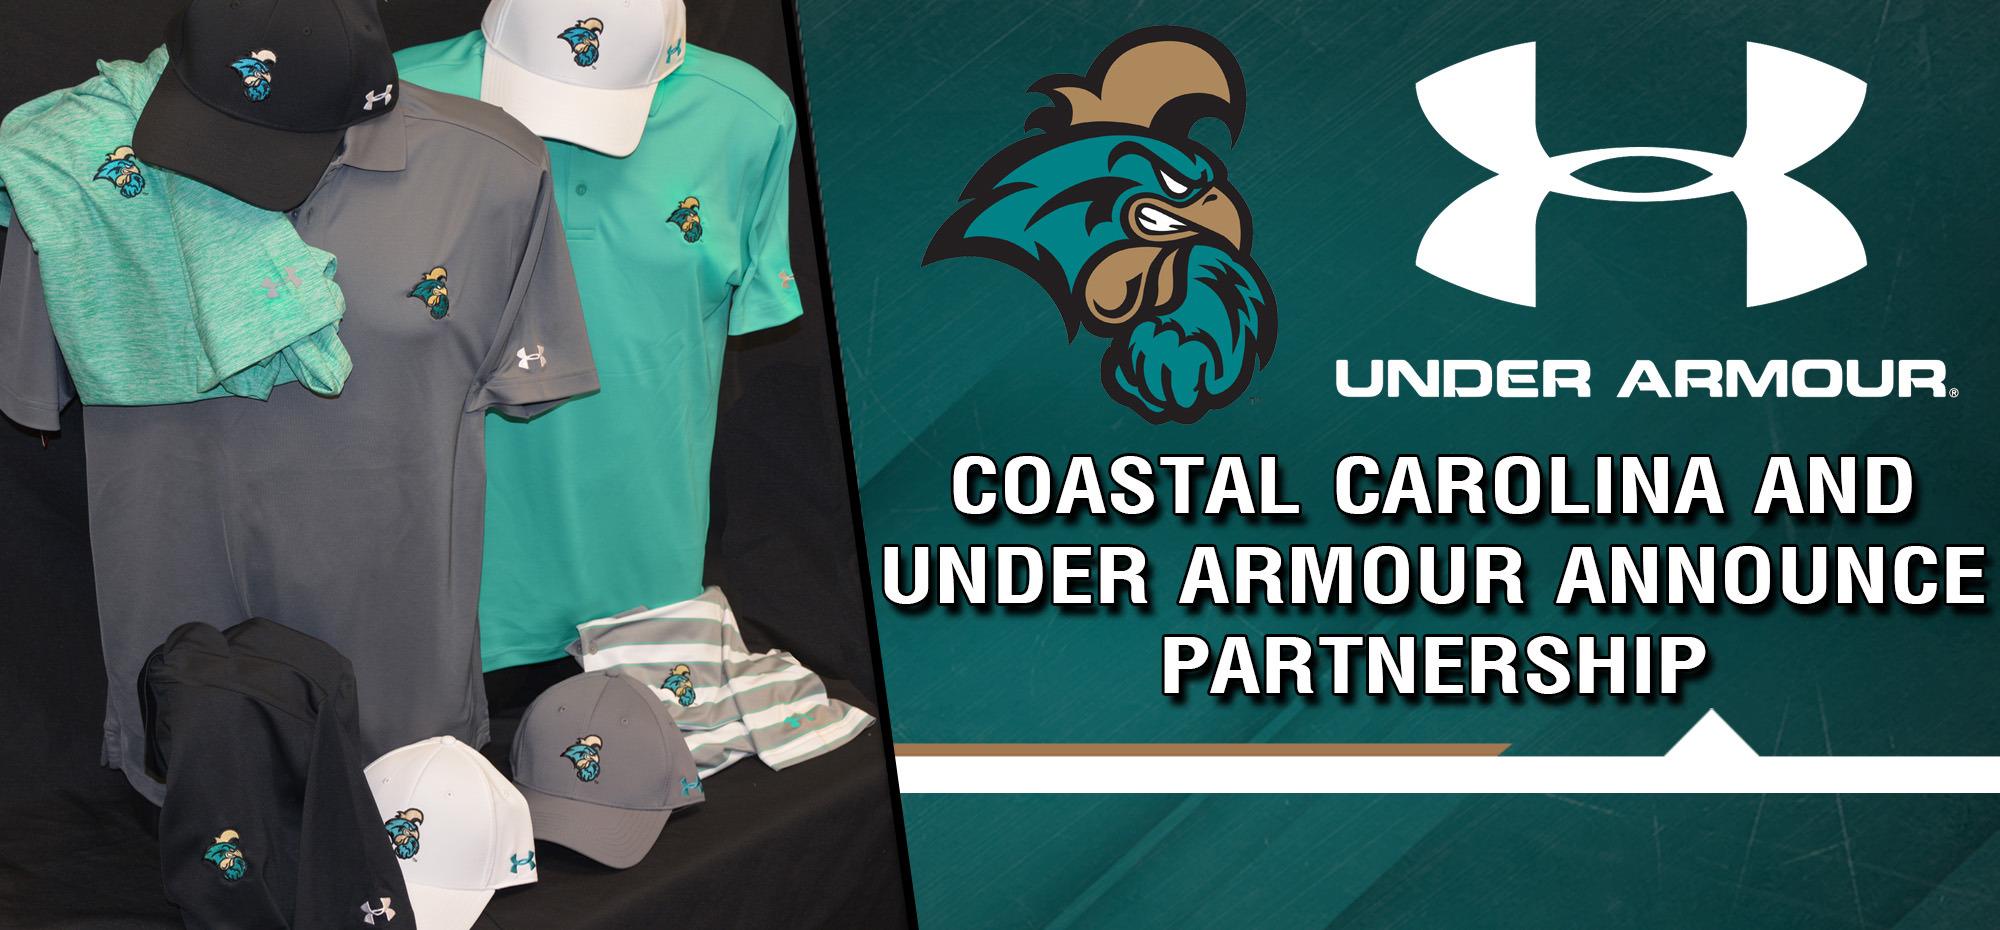 Coastal Carolina team store